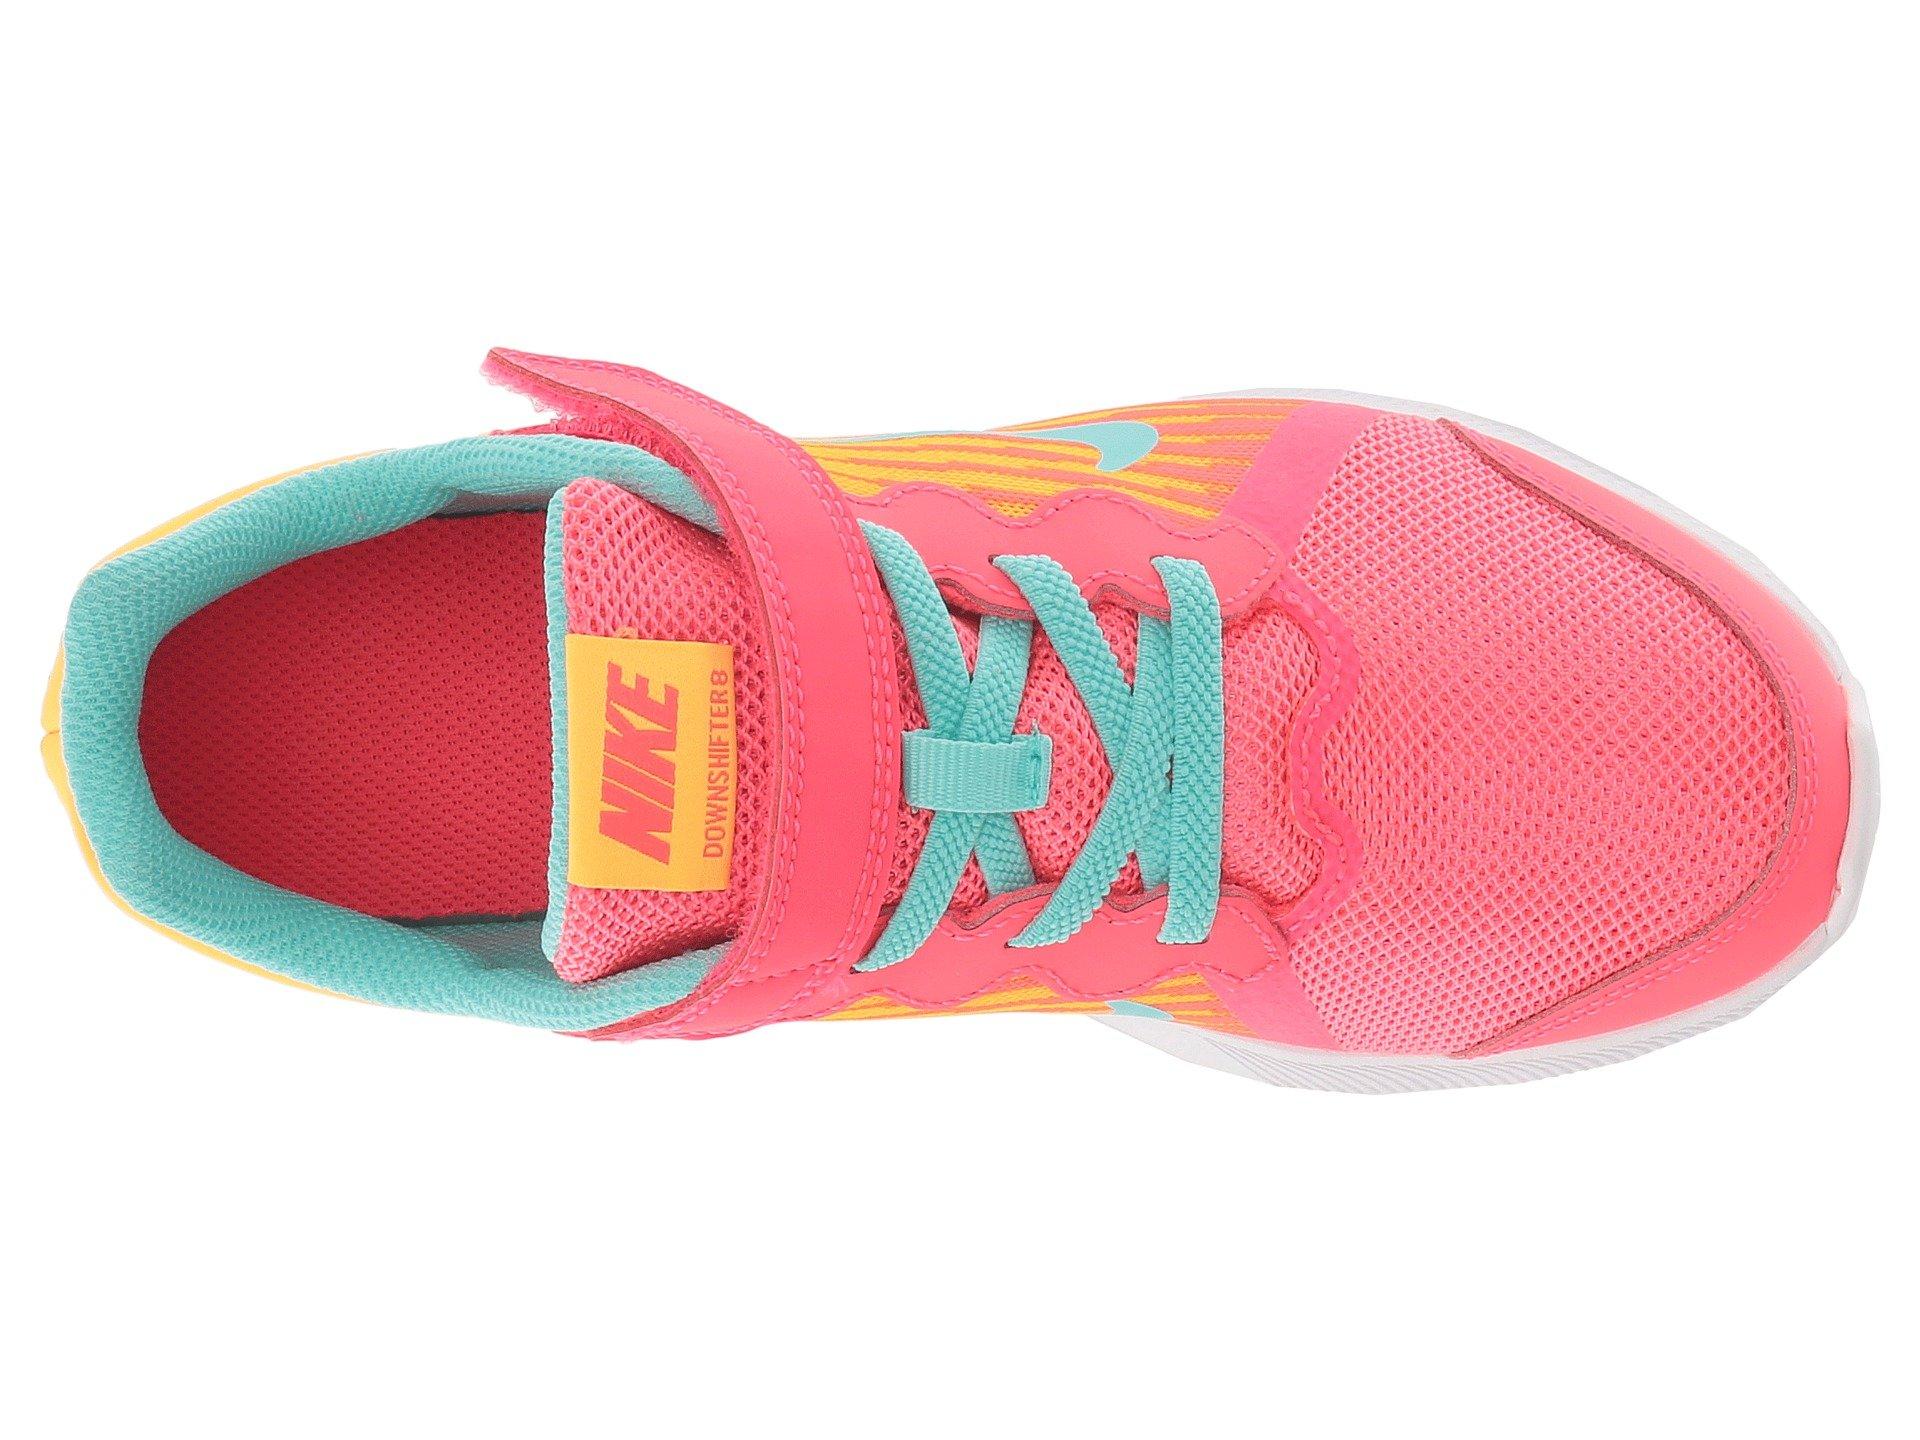 Nike Kids' Preschool Downshifter 8 Fade Running Shoes (1.5, Red/Green) by Nike (Image #9)